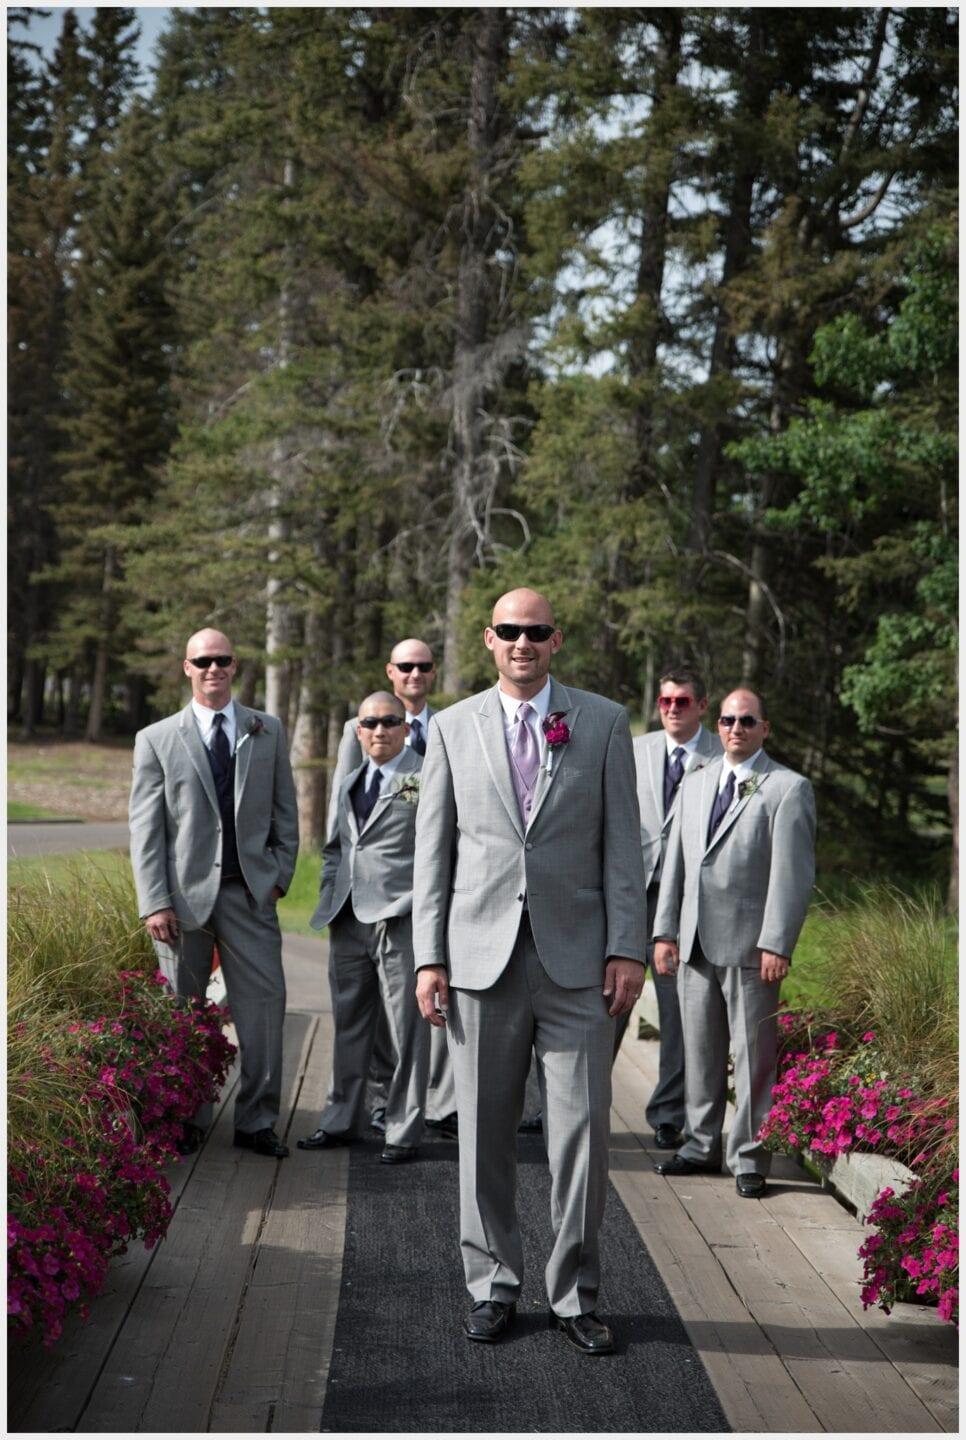 007-Calgary-Priddis Greens Golf and Country Club Wedding_Edmonton_groomsmen_Photography-